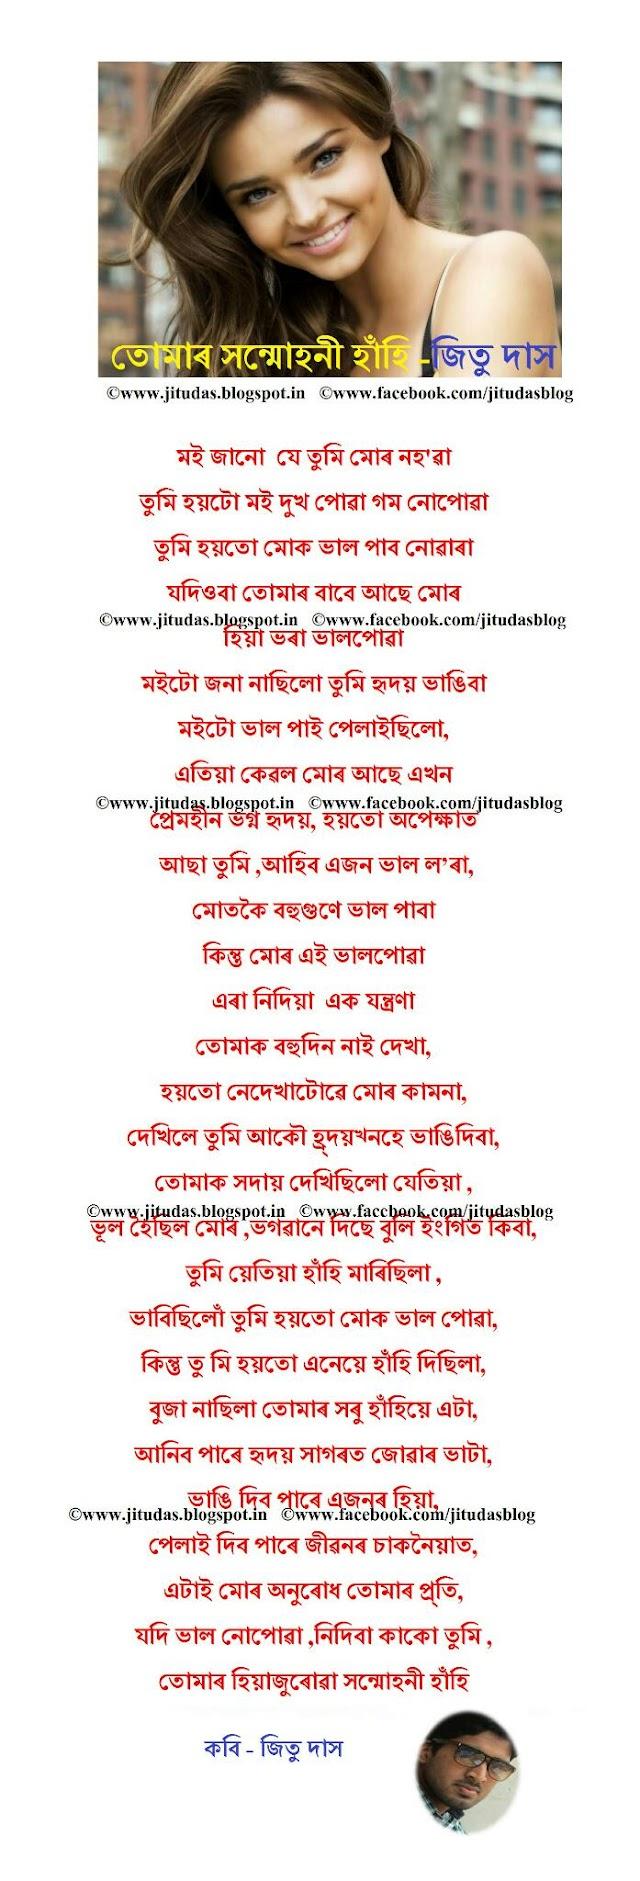 Assamese sad love poem তোমাৰ  সন্মোহণী হাঁহি by Jitu Das poems 2017